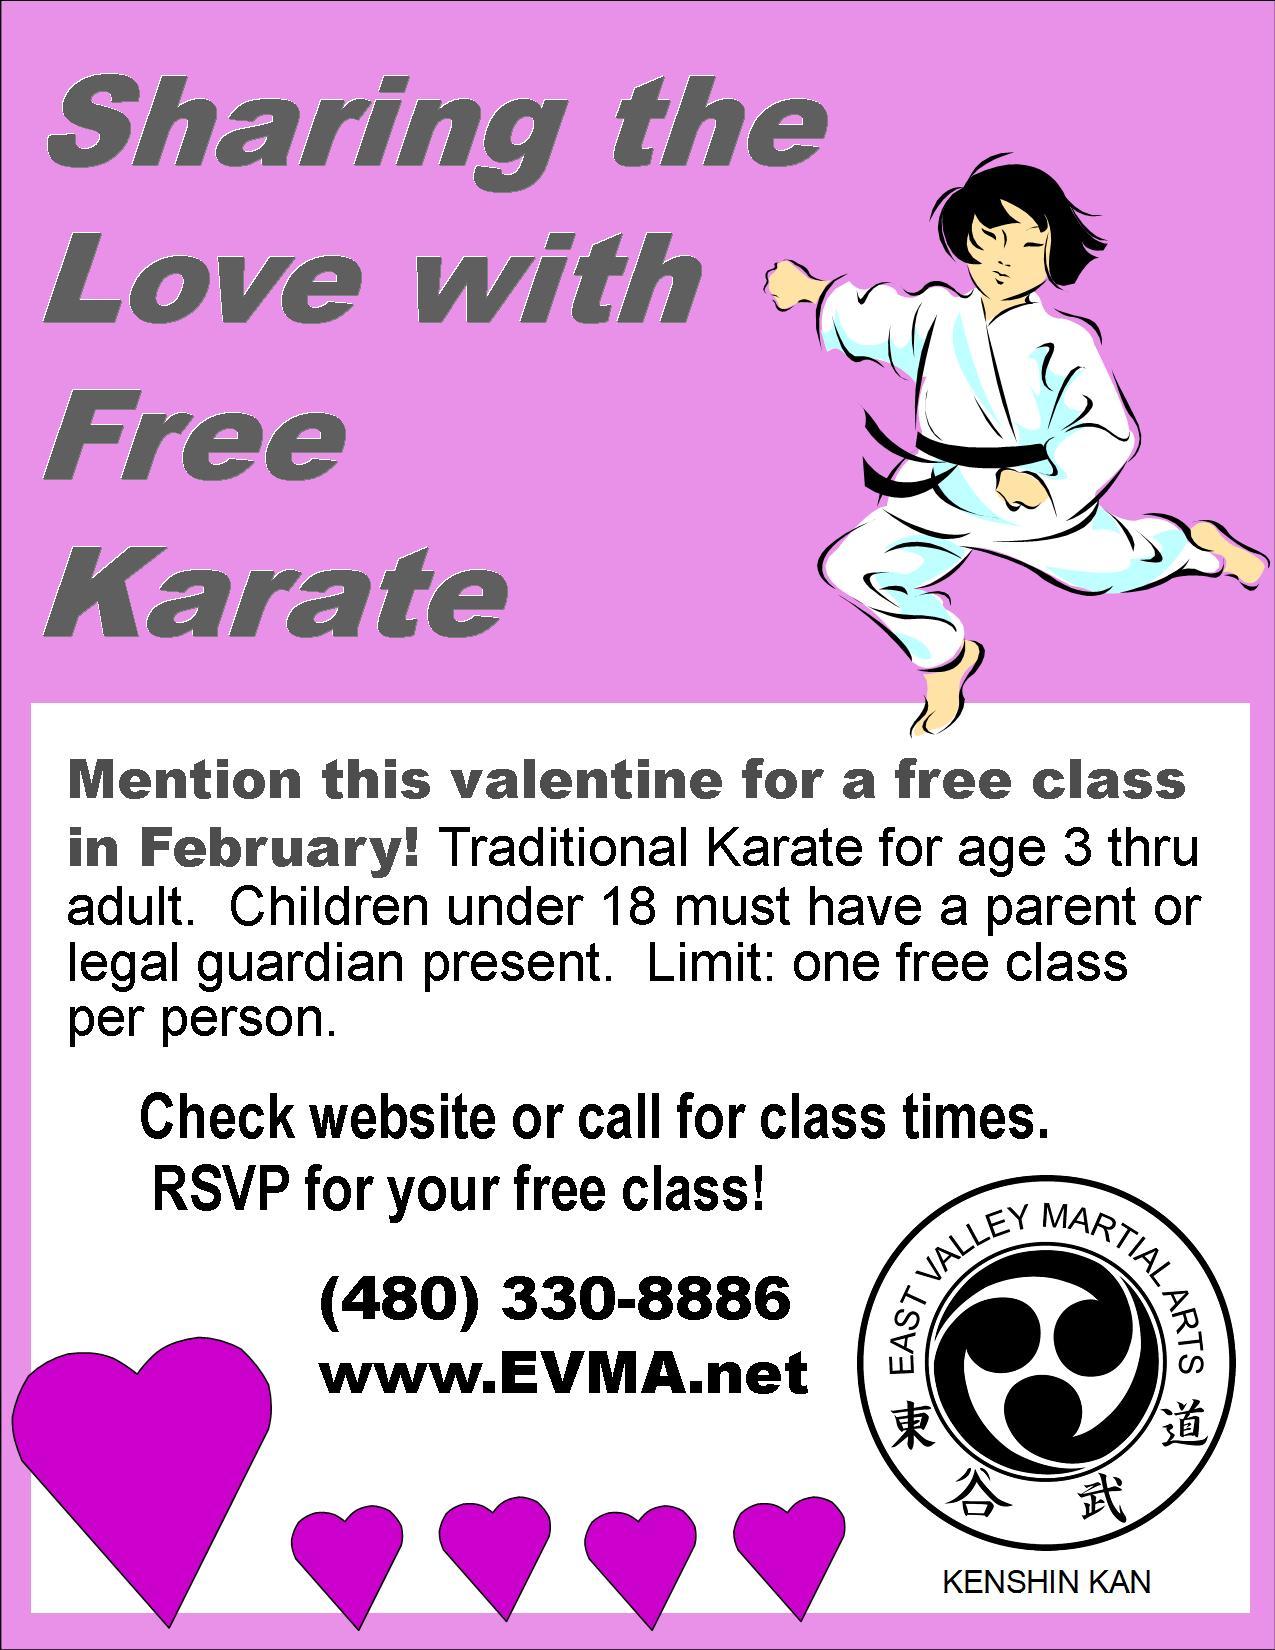 Valentines free class 19